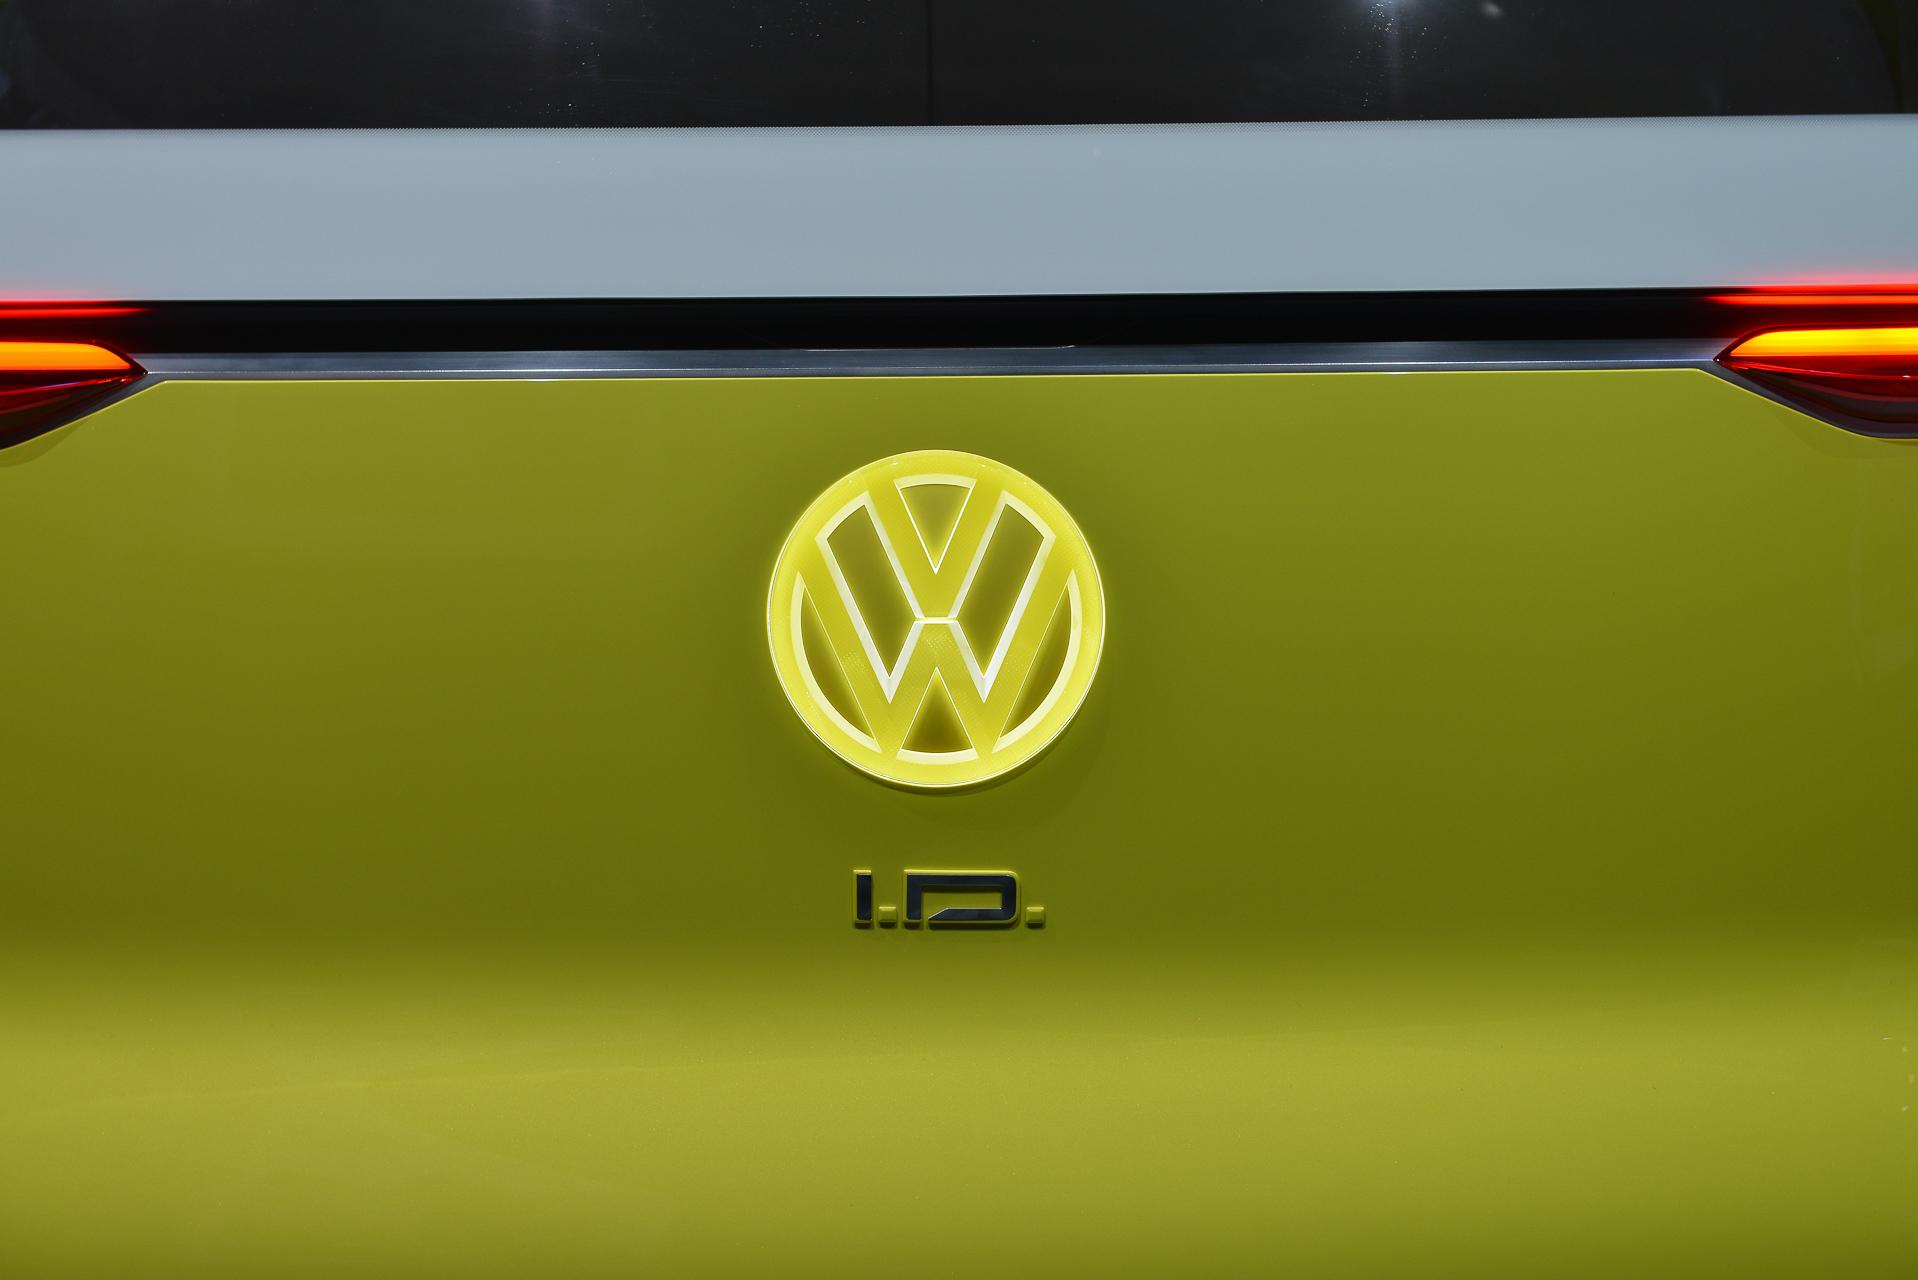 Volkswagen readying flagship electric sedan concept for 2018 Geneva motor show